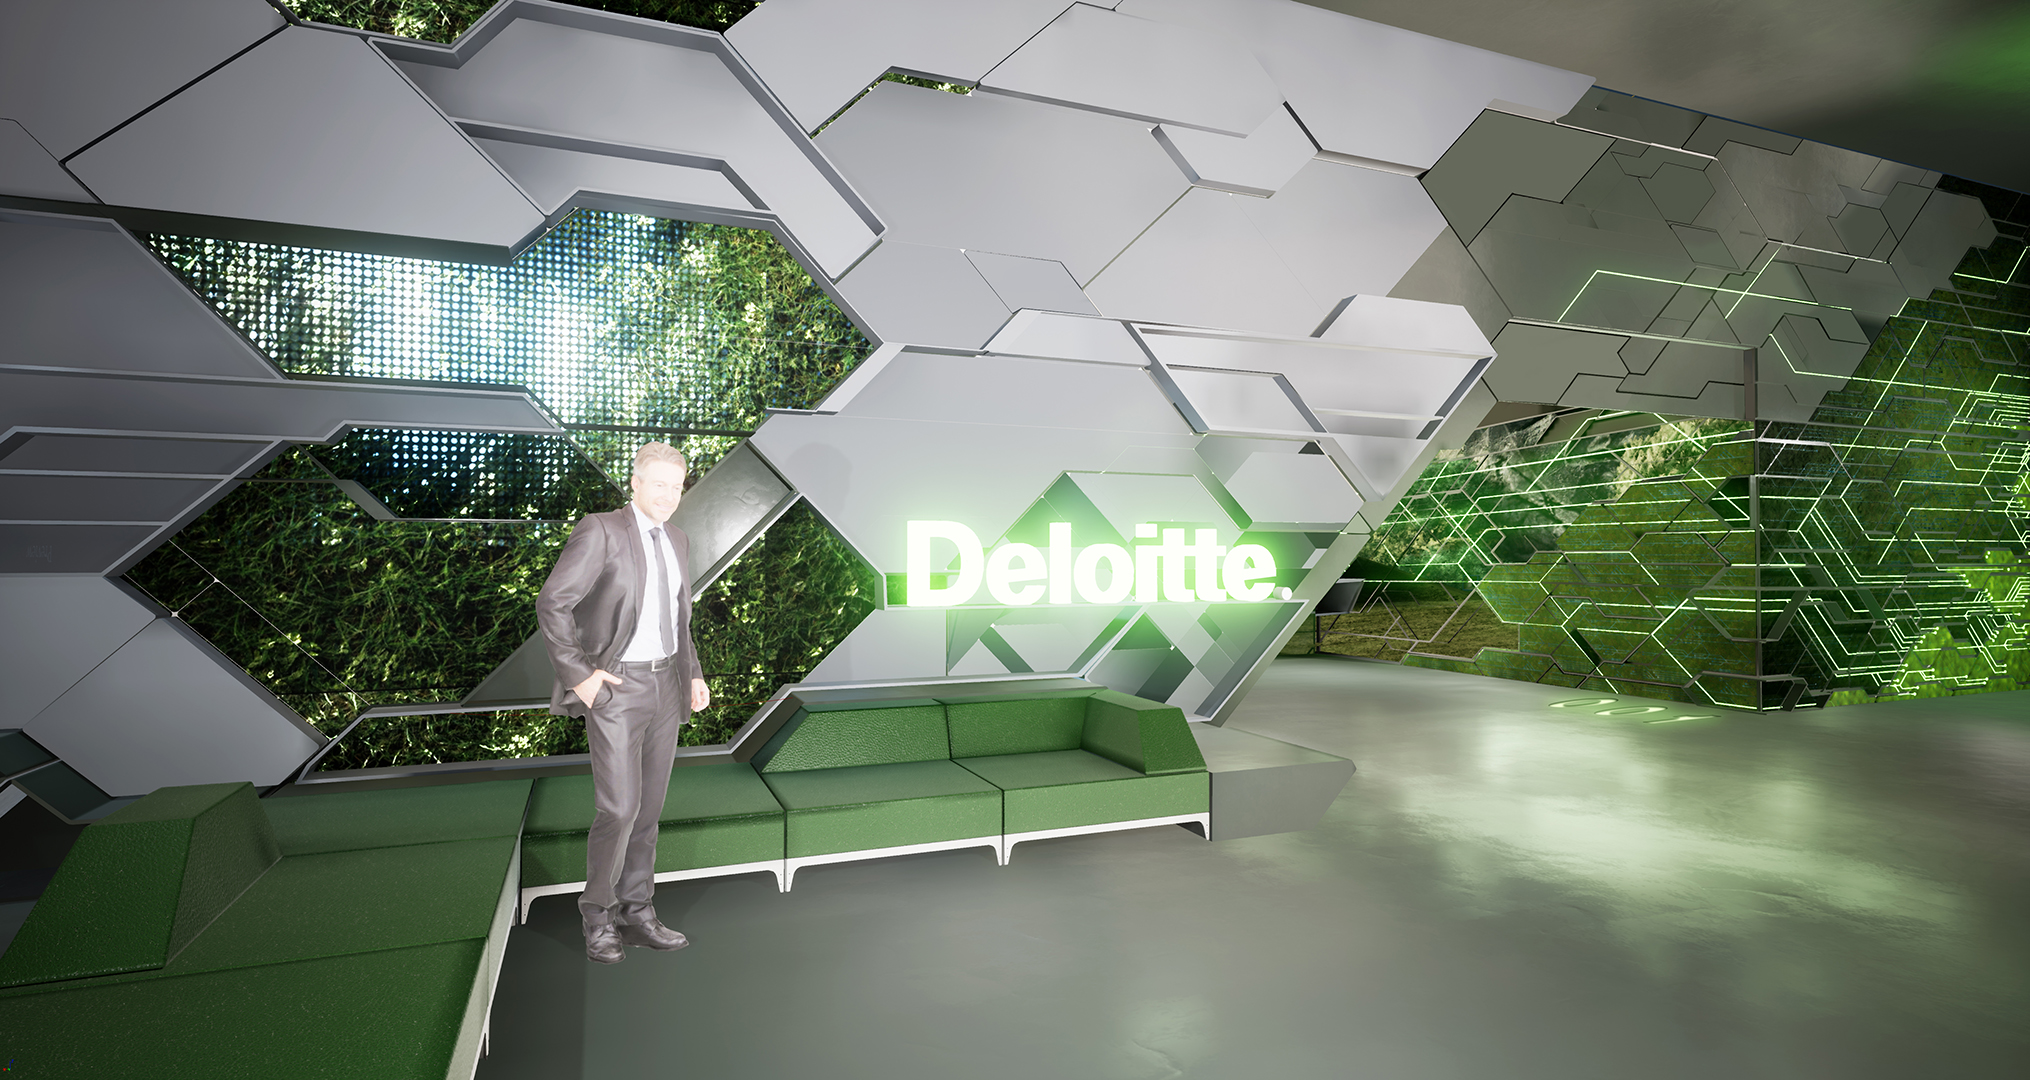 Deloitte_2_small.jpg